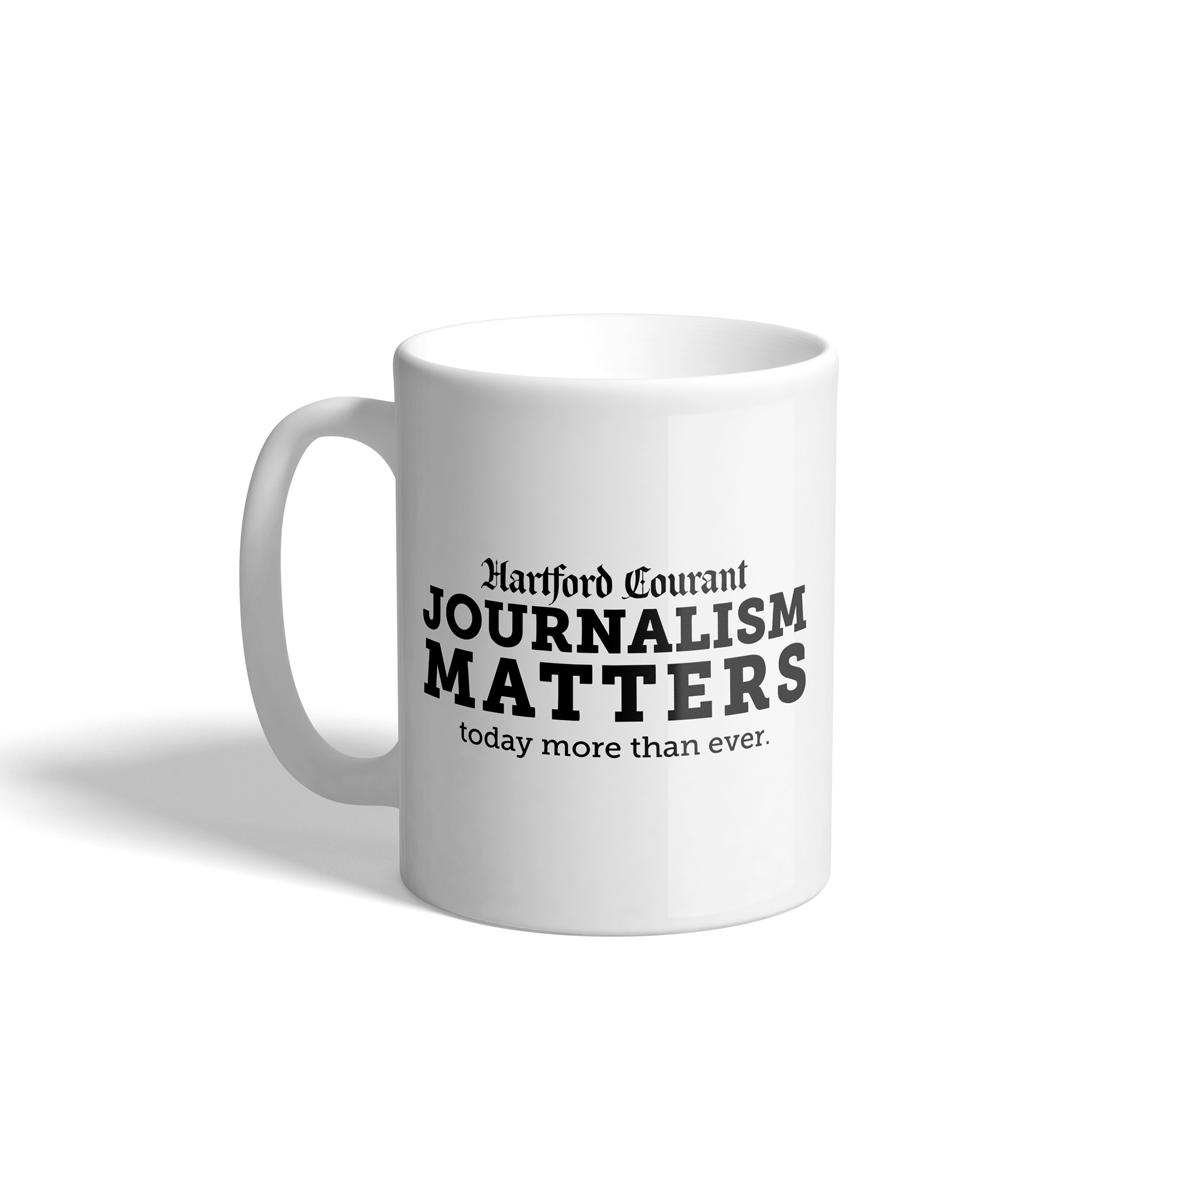 Hartford Courant Journalism Matters Mug